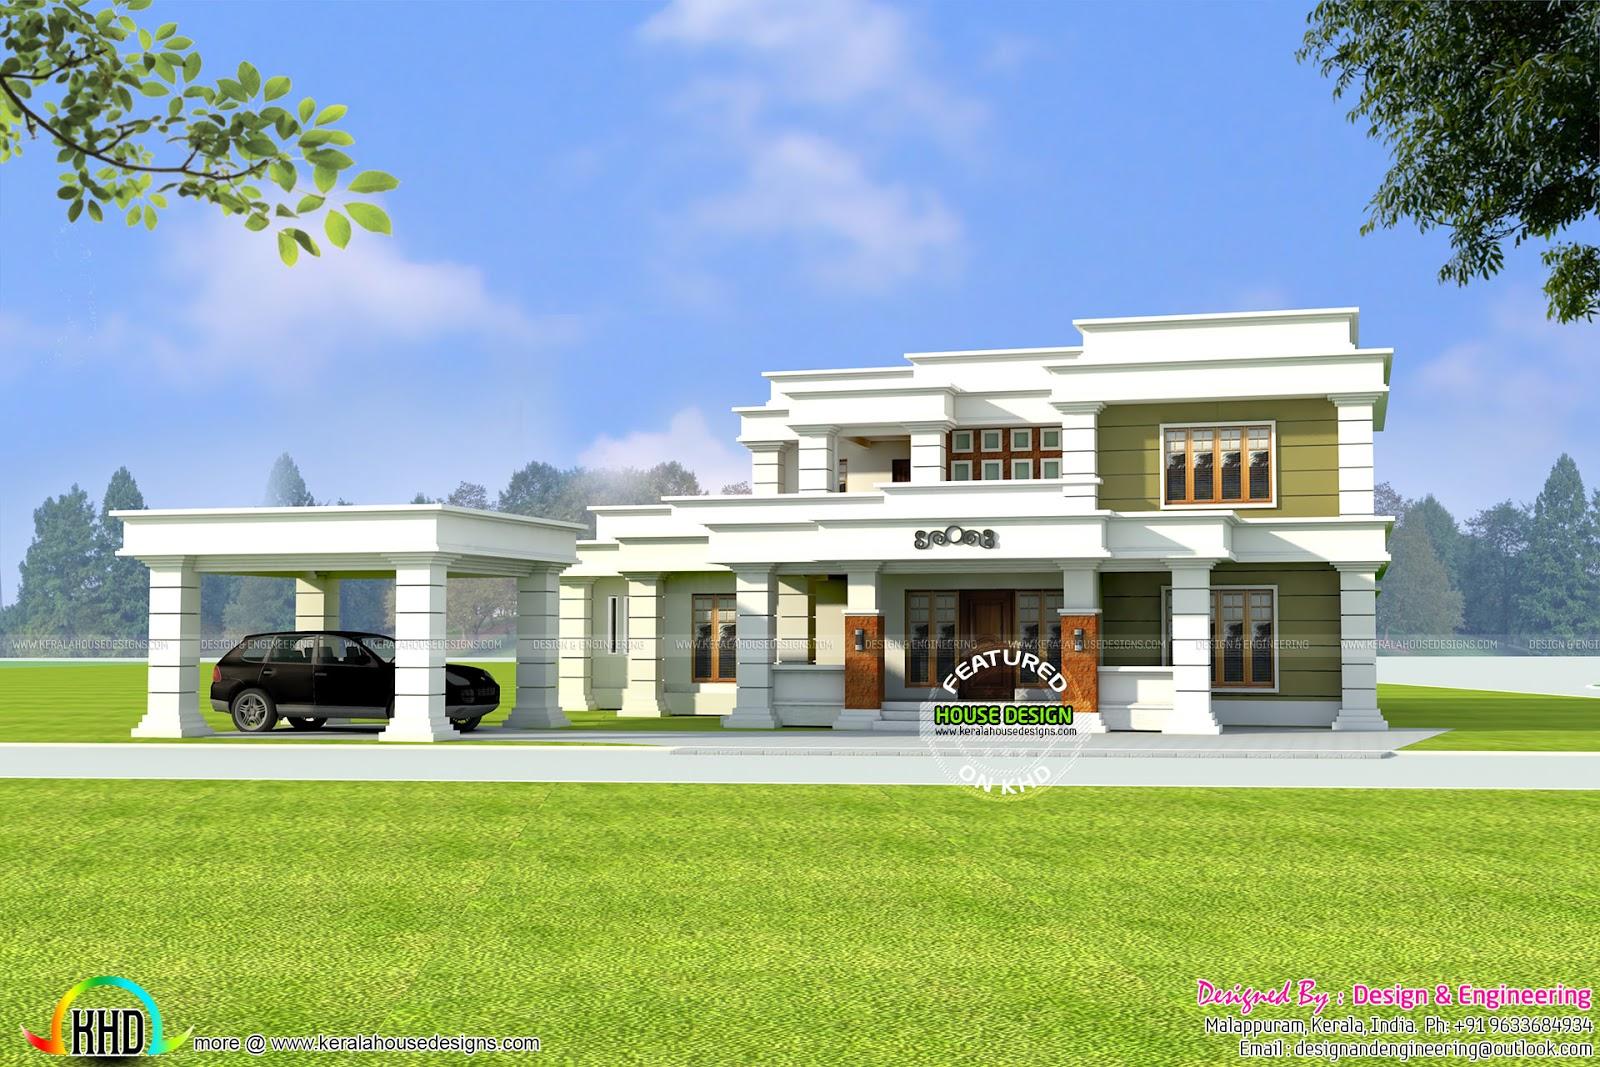 Decorative Flat Roof : Sq yd decorative flat roof home kerala design